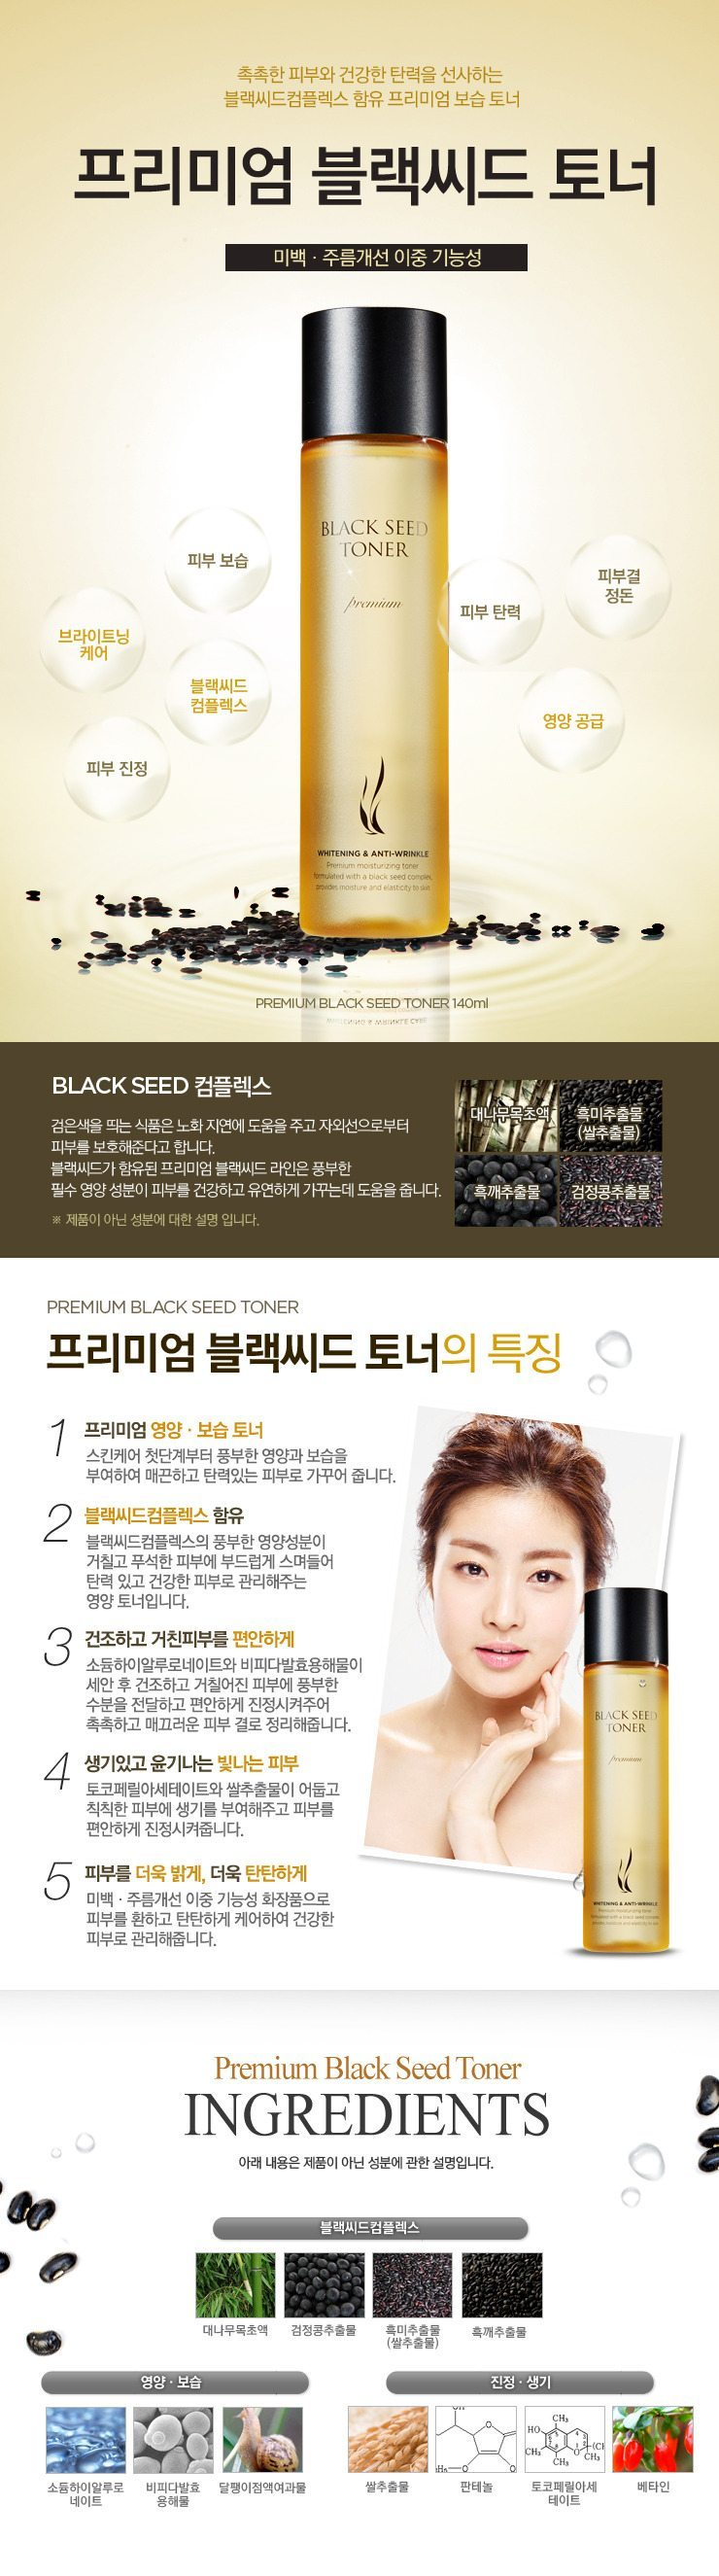 AHC Premium Black Seed Toner 140ml malaysia singapore indonesia